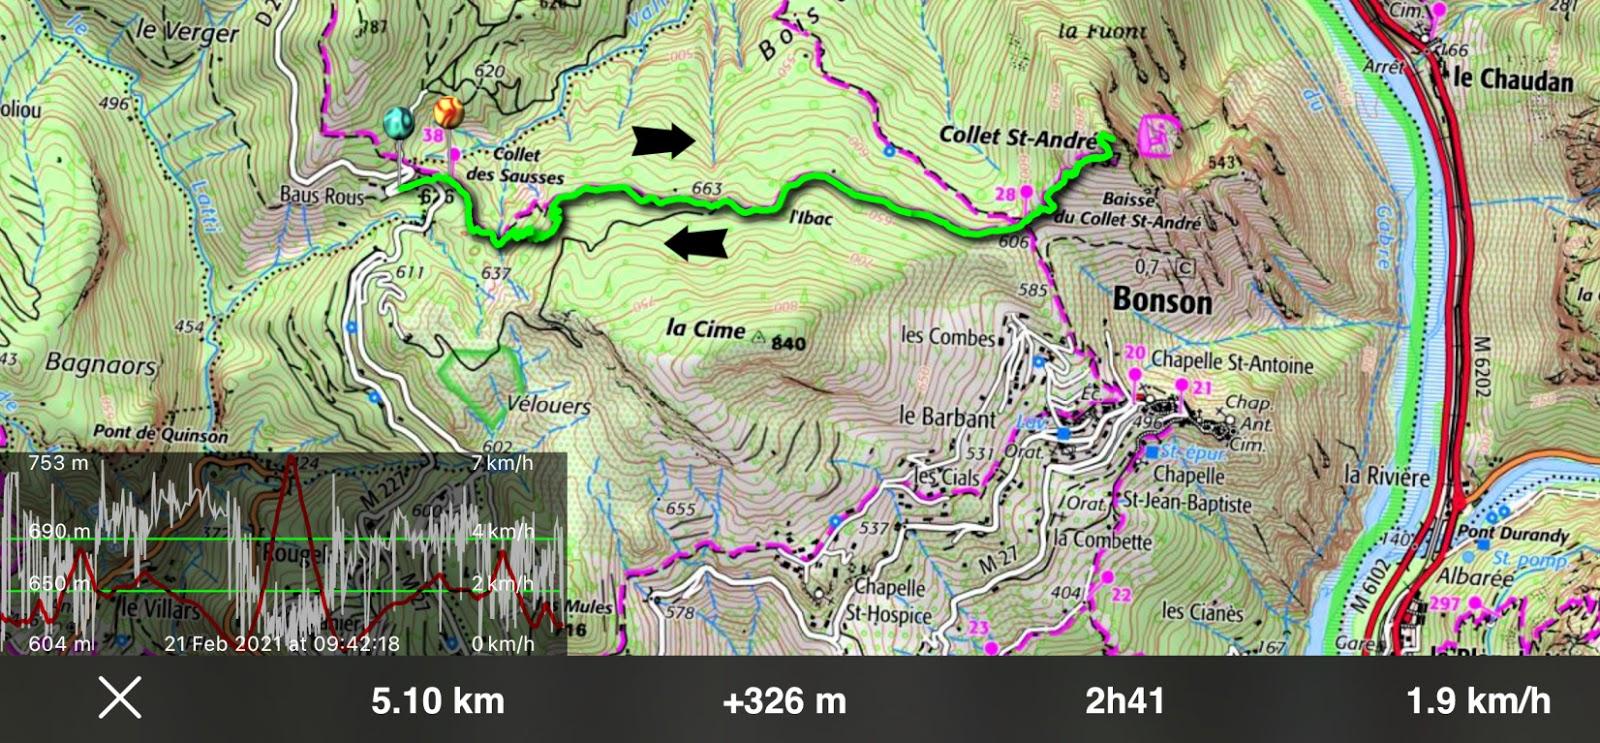 Collet St-André hike track